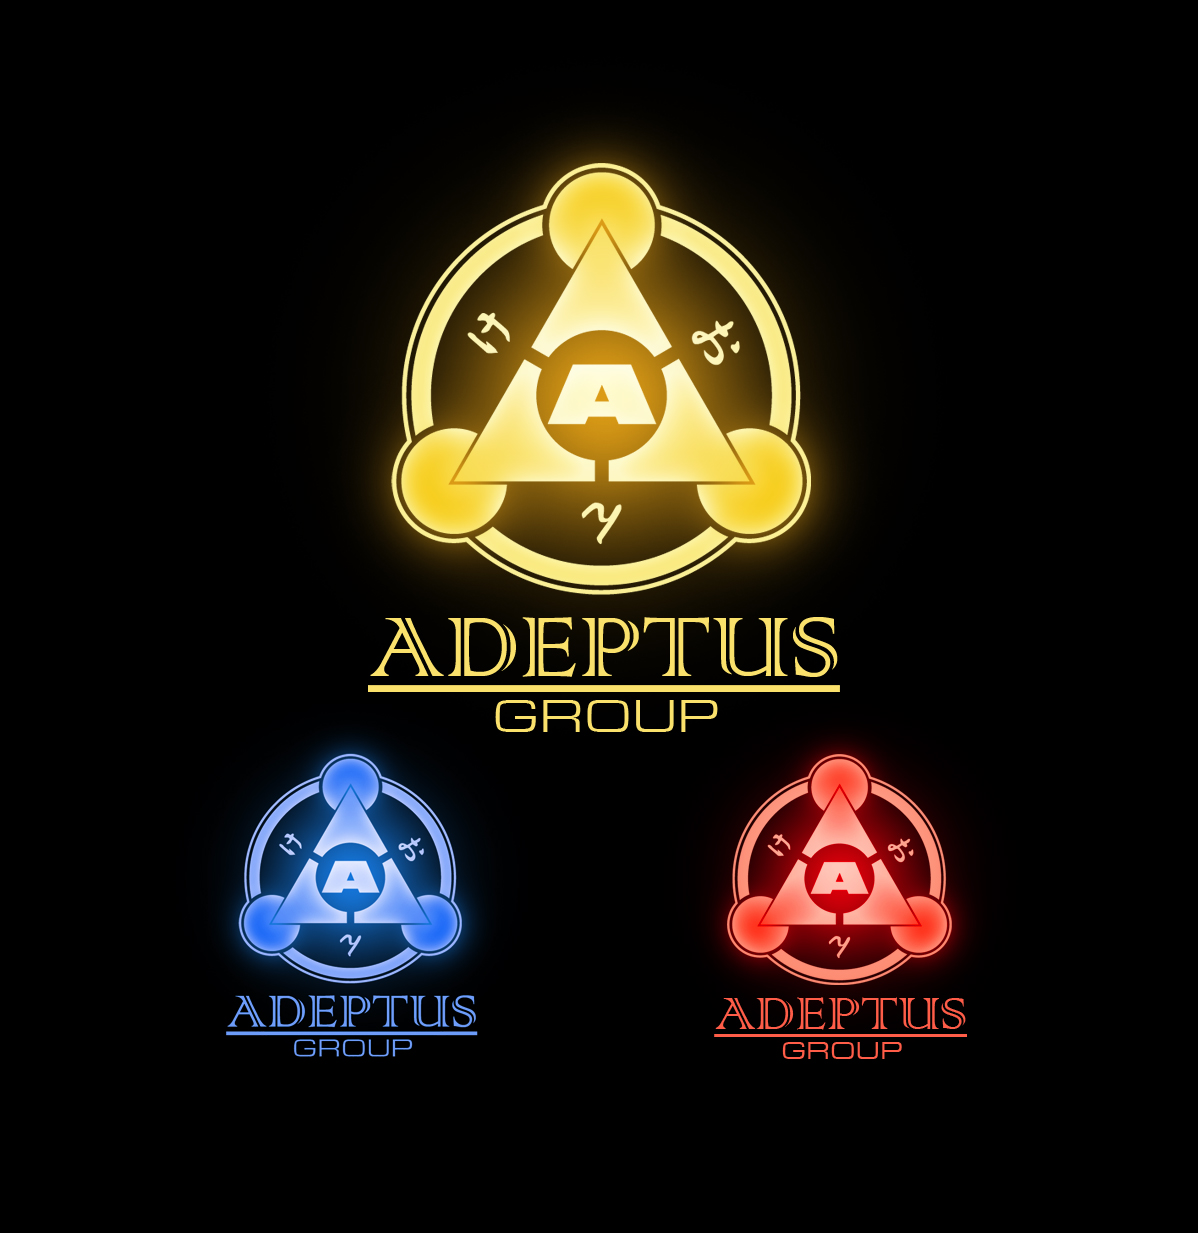 Logo Design by Mik El - Entry No. 30 in the Logo Design Contest New Logo Design for Adeptus Group.